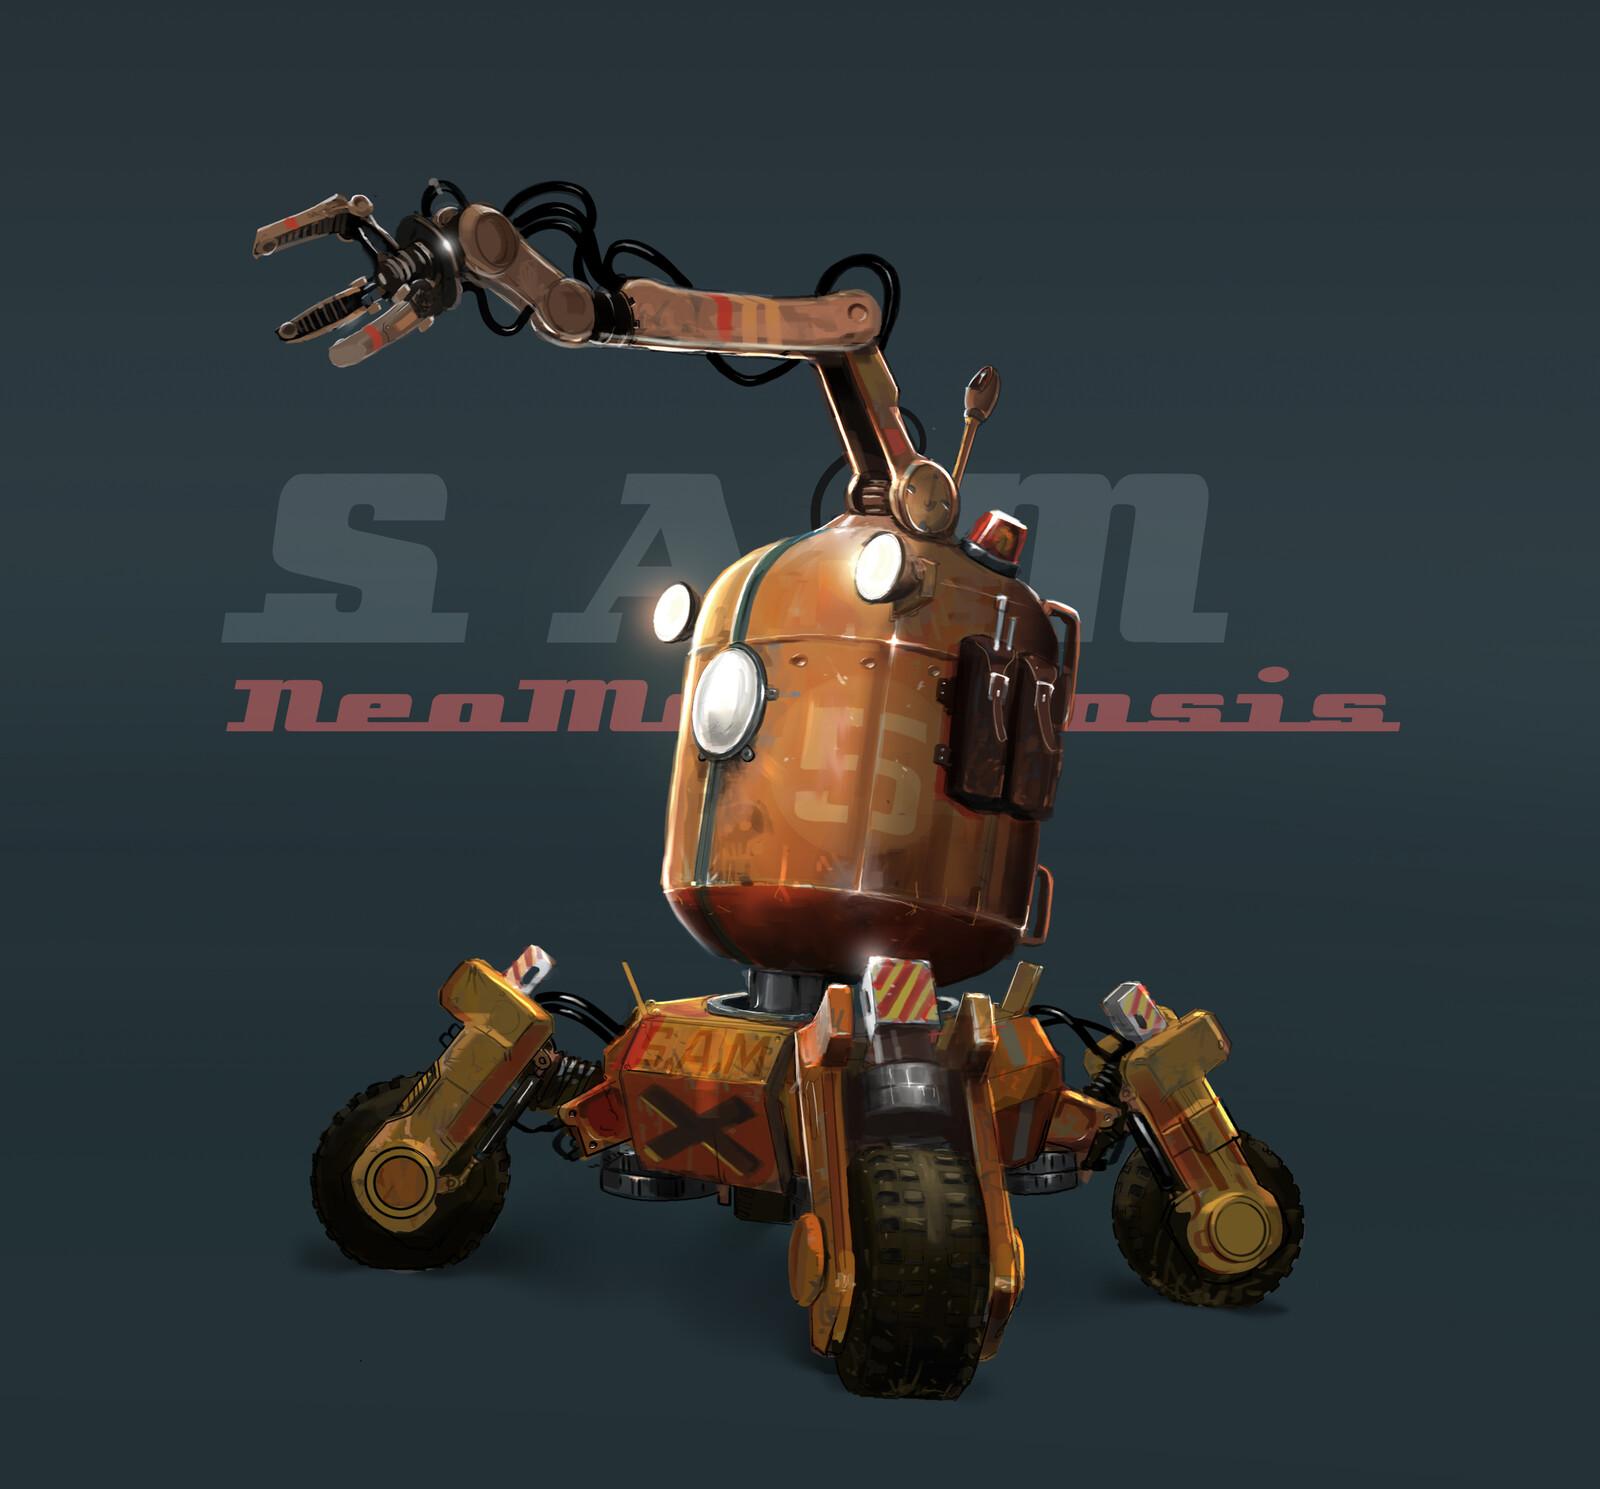 S.A.M the Robot!